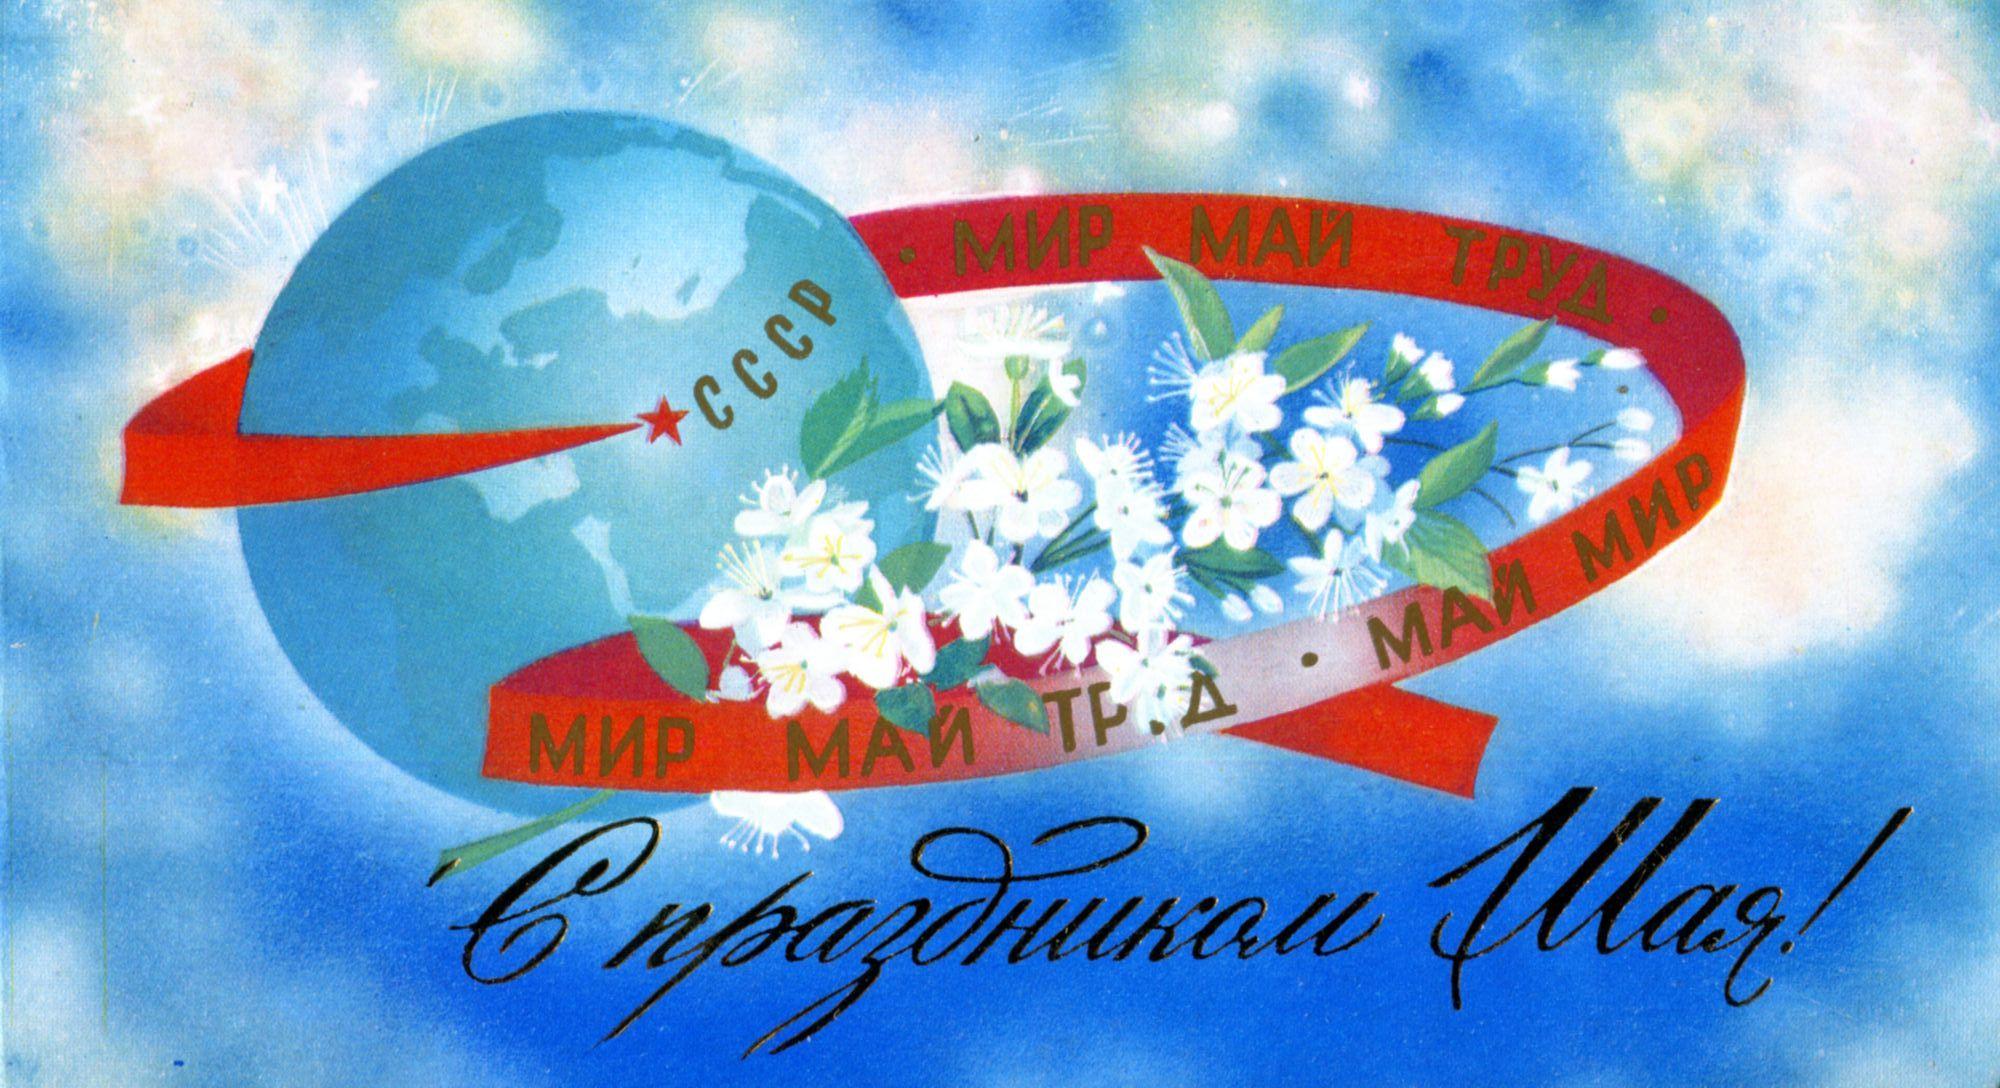 Светик тебе, открытки май мир труд